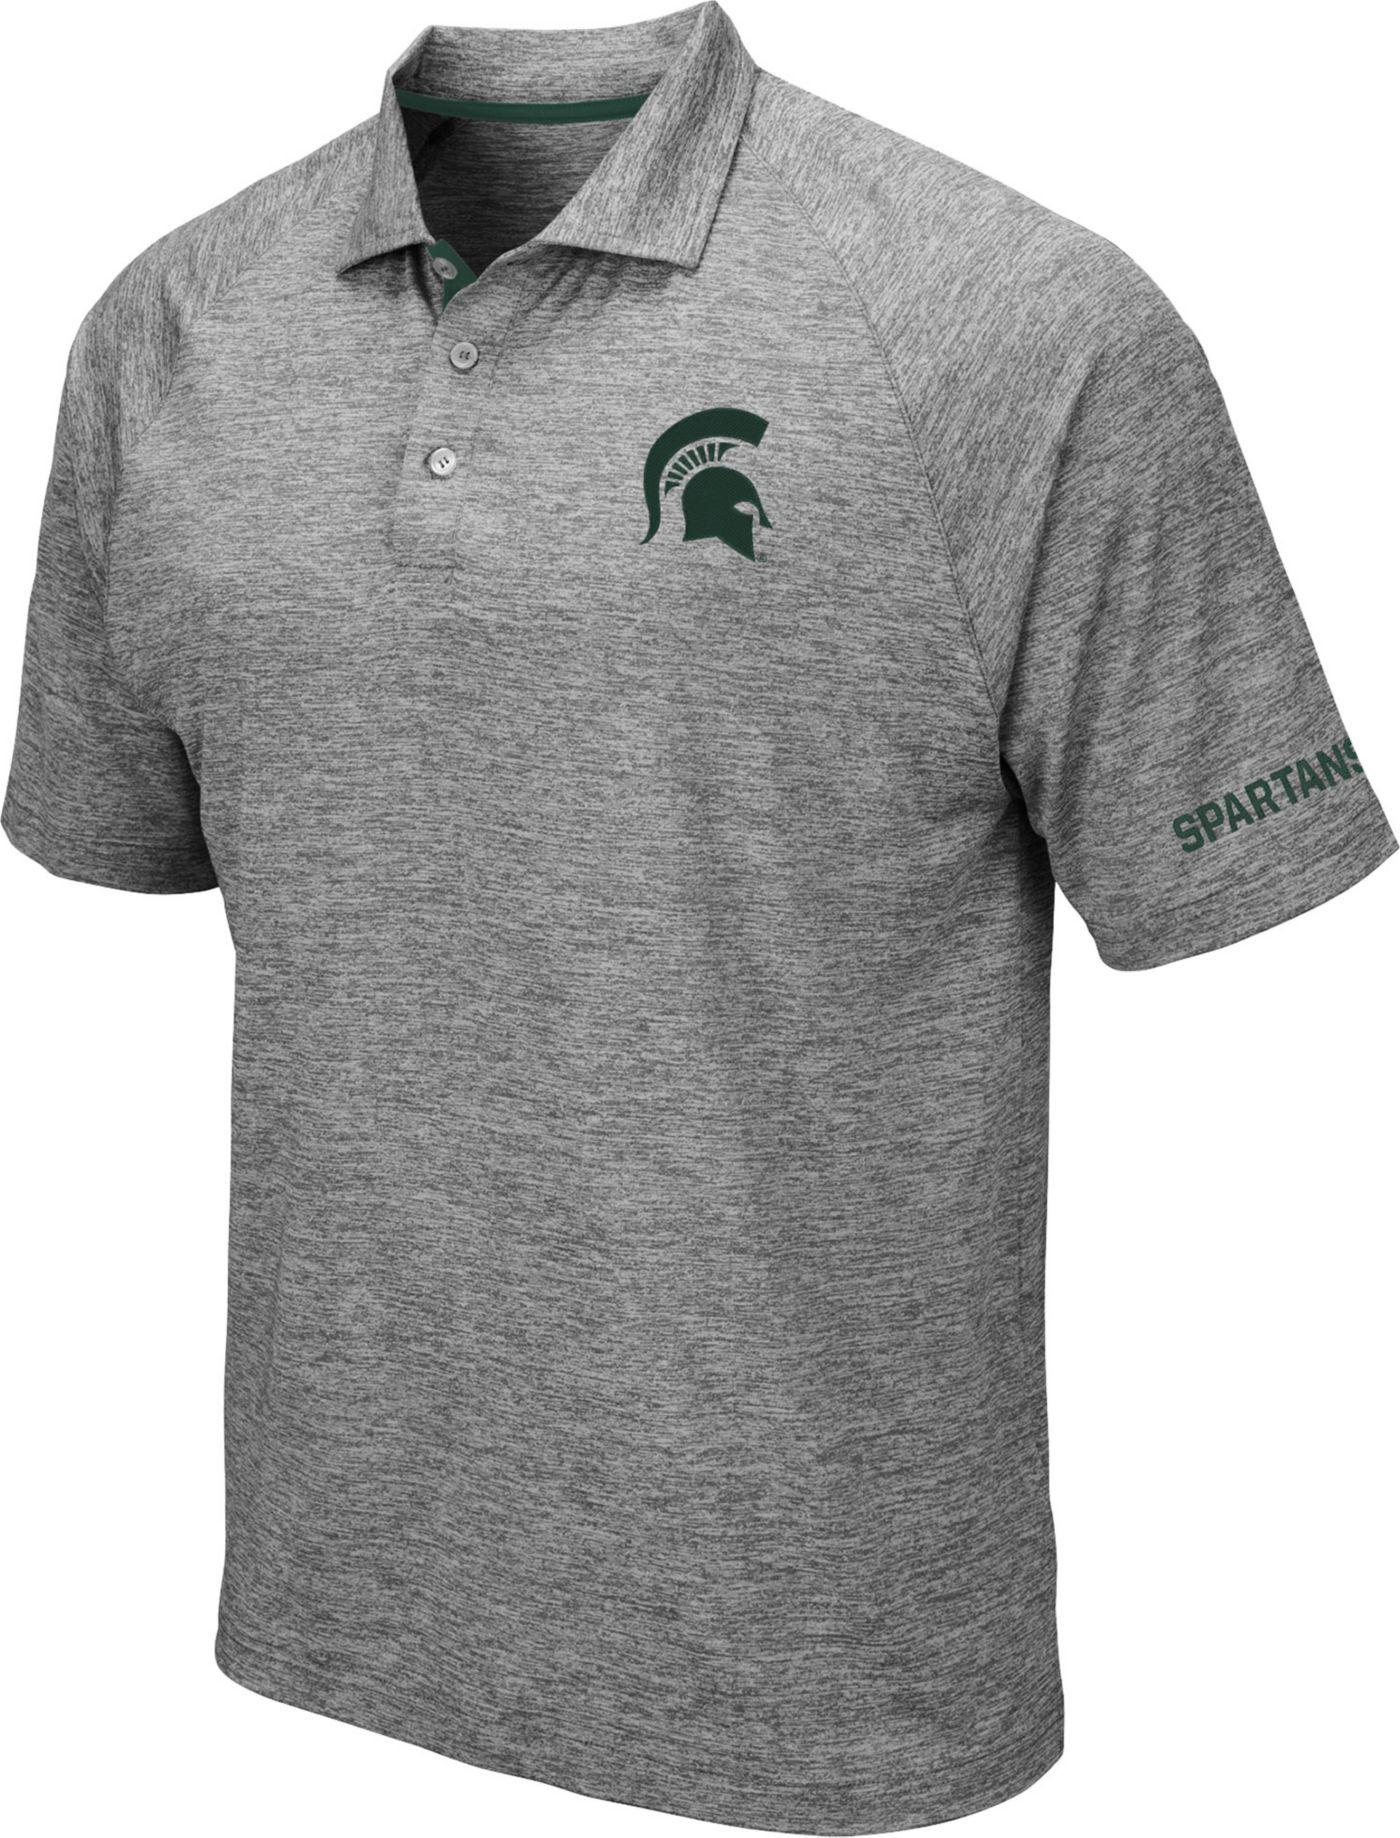 Colosseum Men's Michigan State Spartans Grey Chip Shot Polo